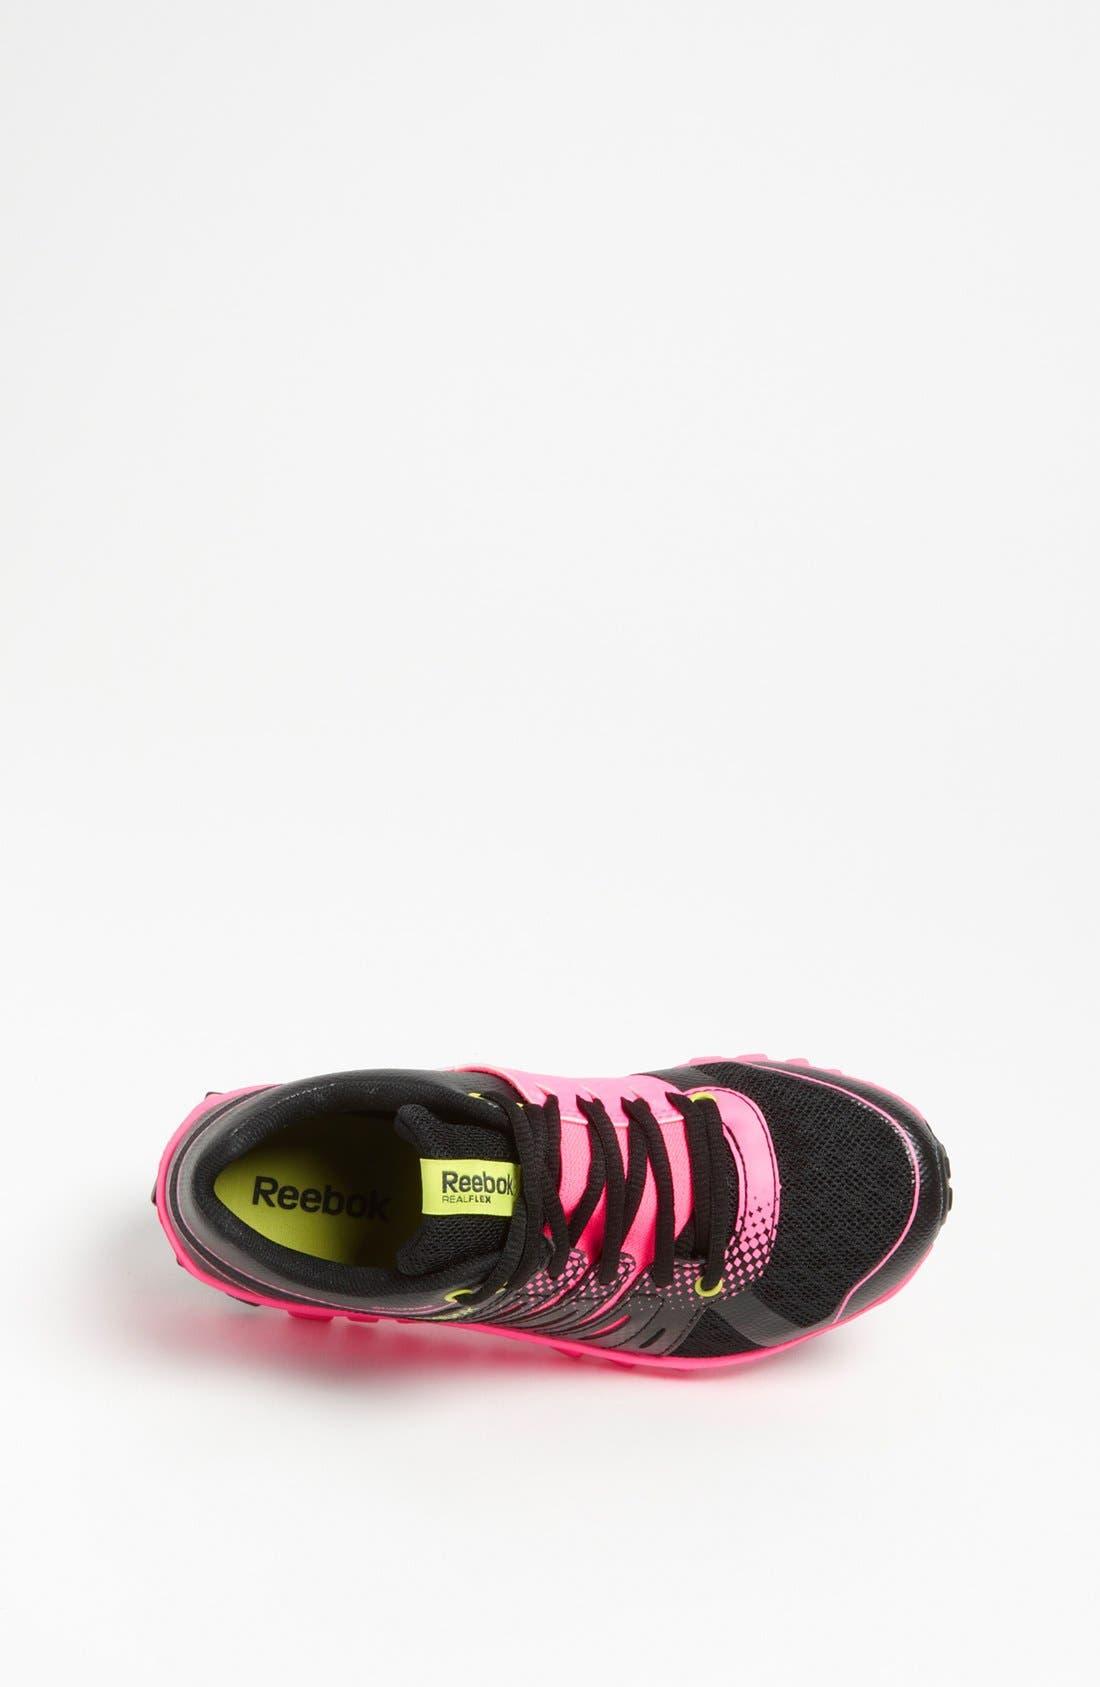 Alternate Image 3  - Reebok 'RealFlex Strength' Training Sneaker (Toddler, Little Kid & Big Kid)